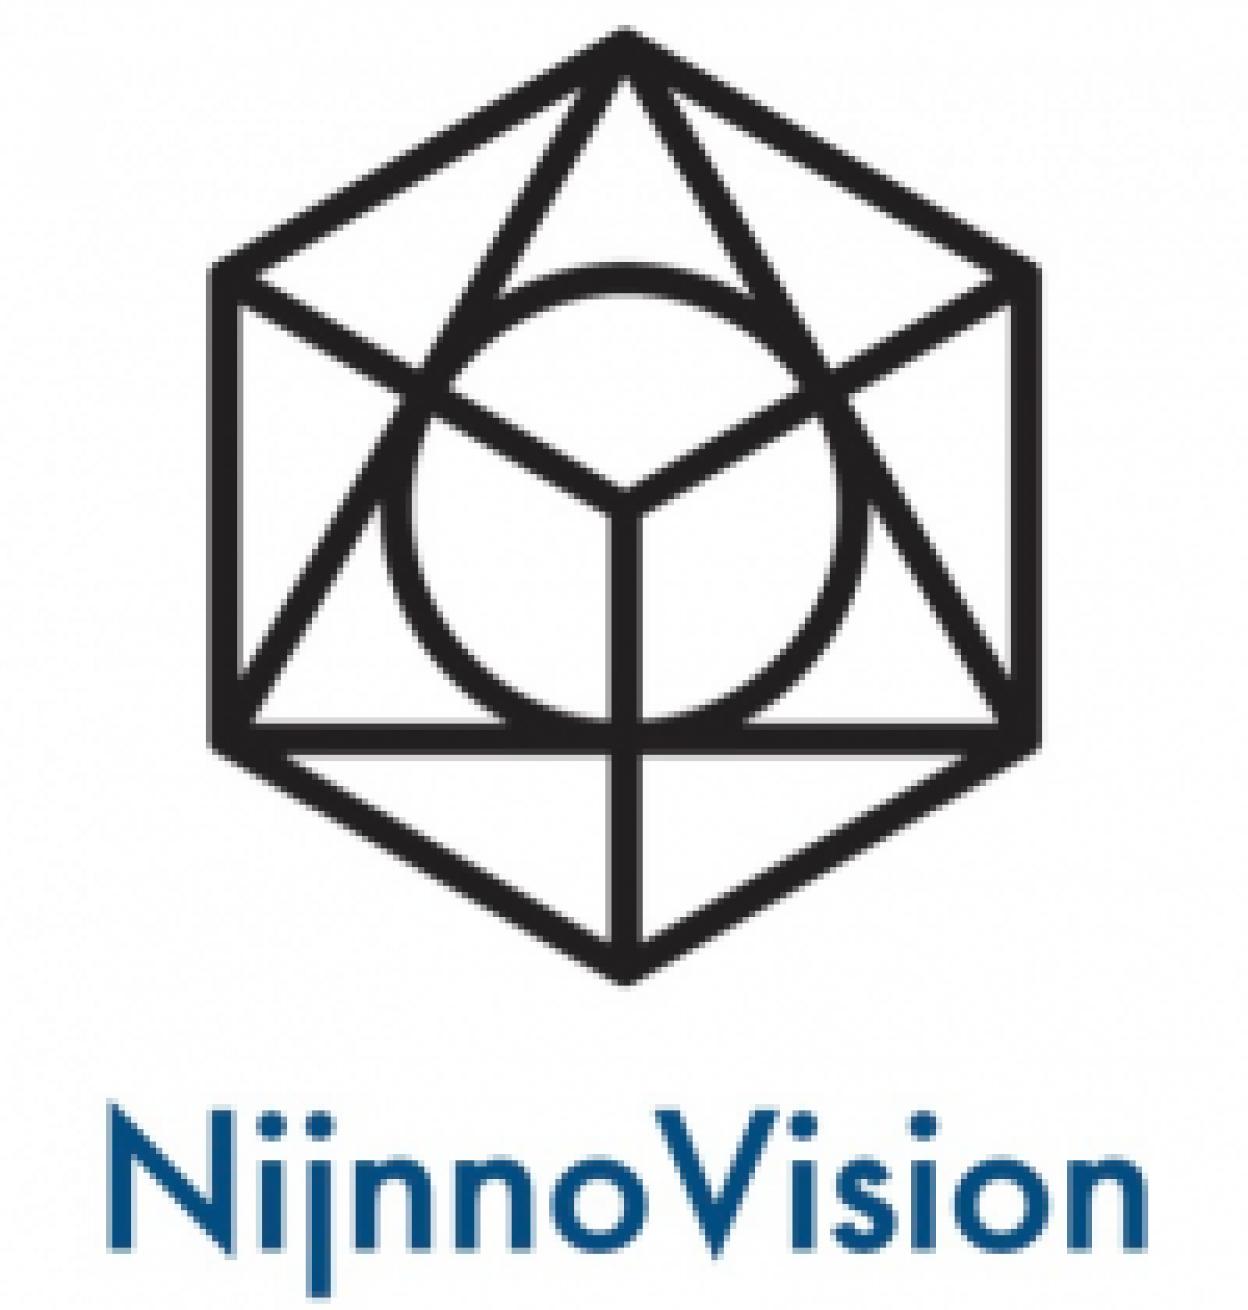 NijnnoVision